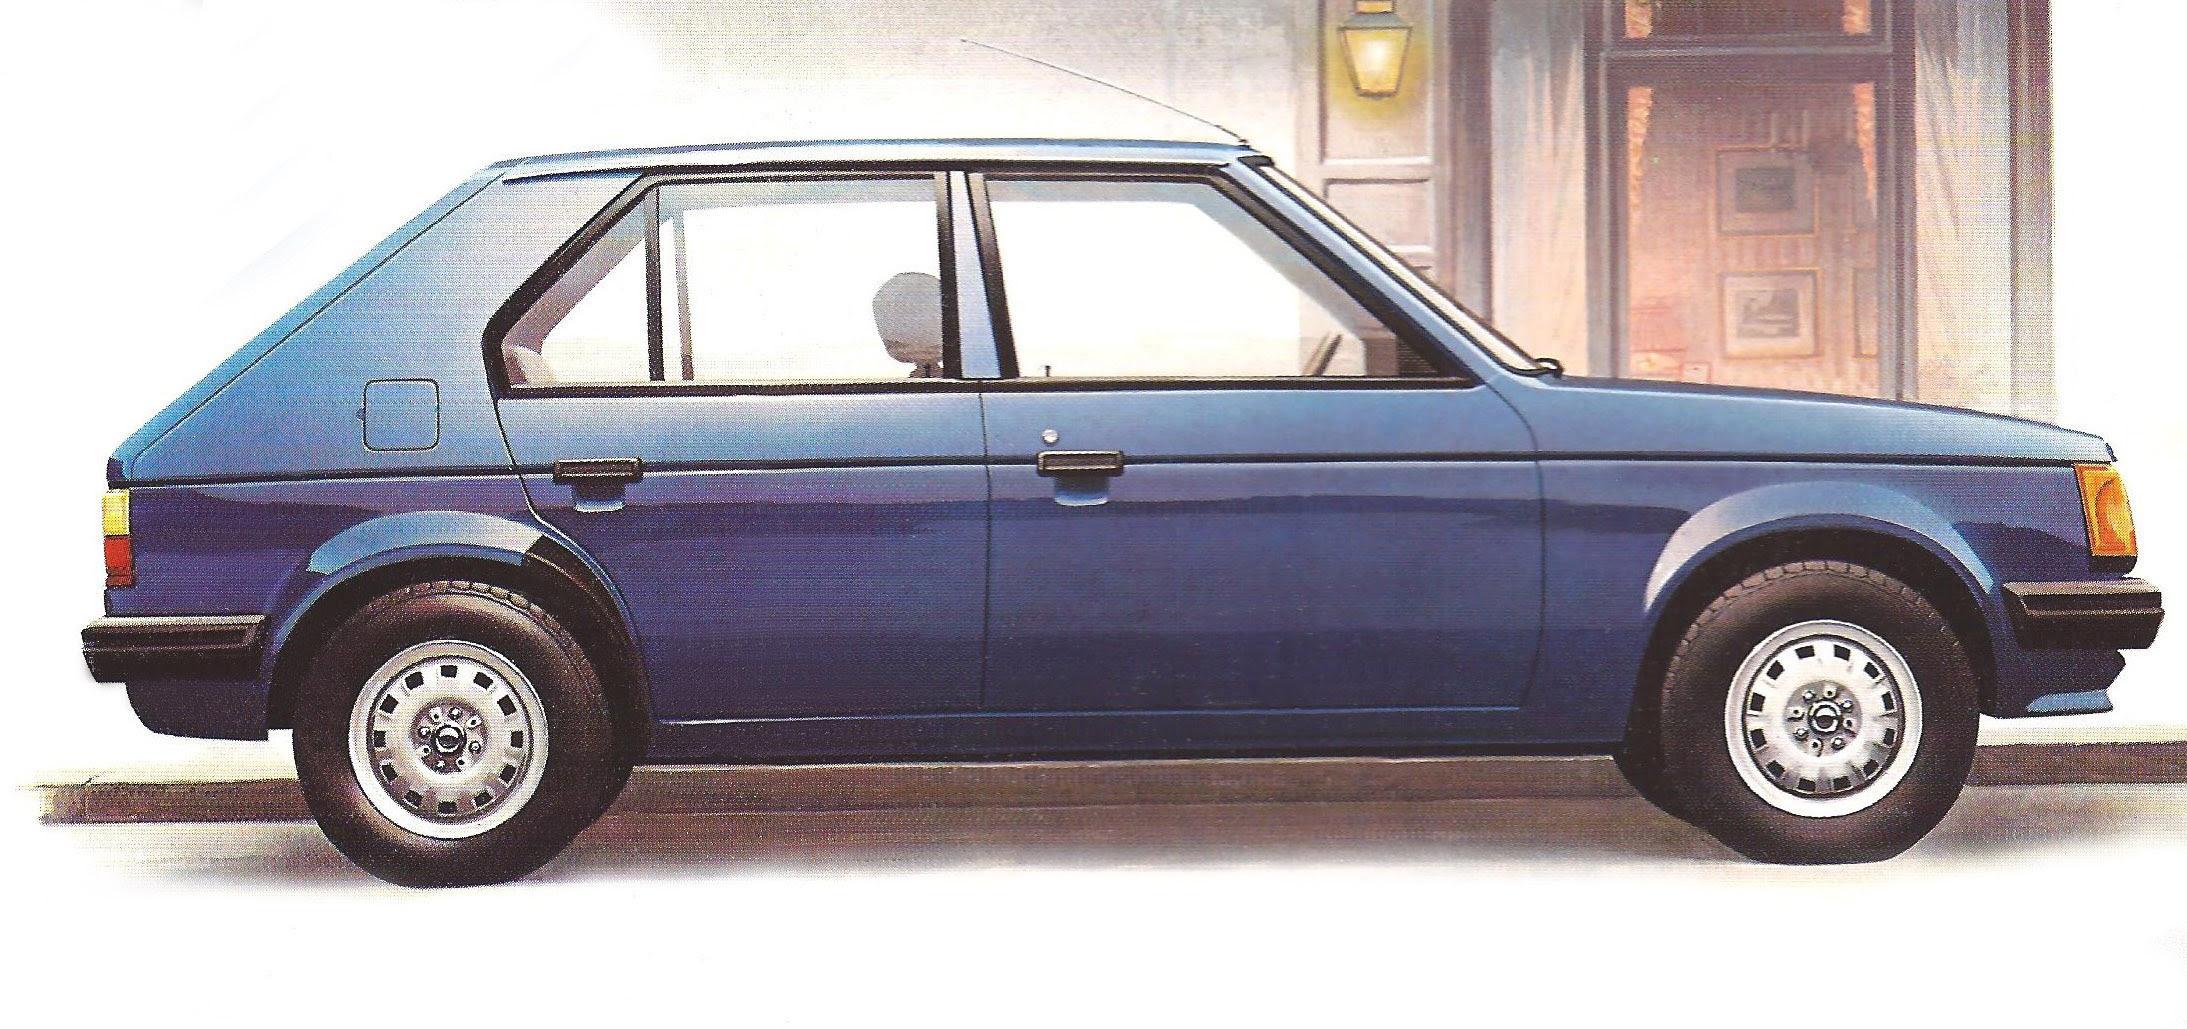 Hatch Heaven 1978 Simca Horizon Gl